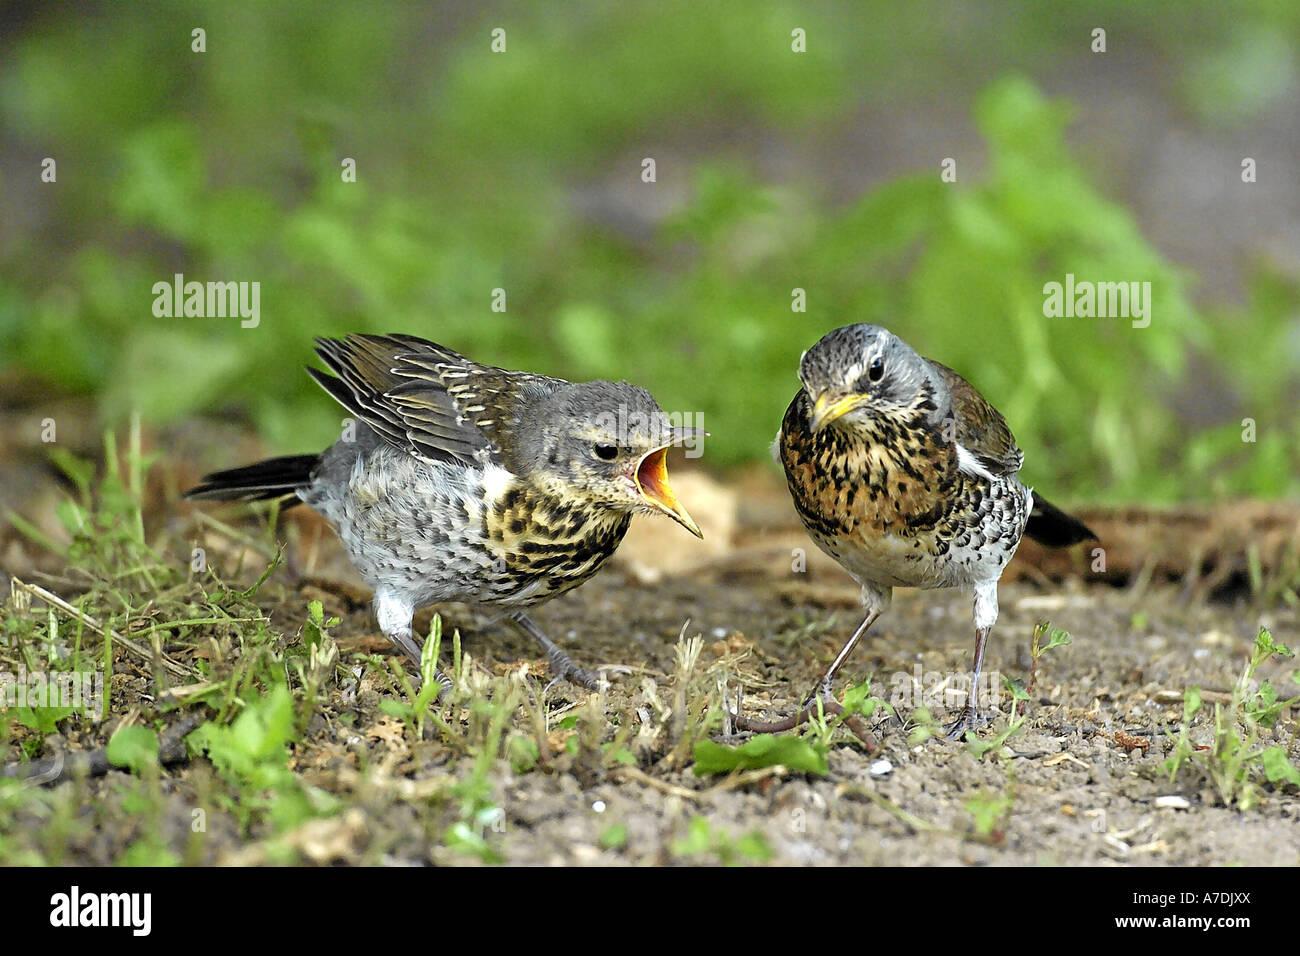 Wacholderdrossel Turdus pilaris Fieldfare Krummetvogel Europe Europa Stock Photo